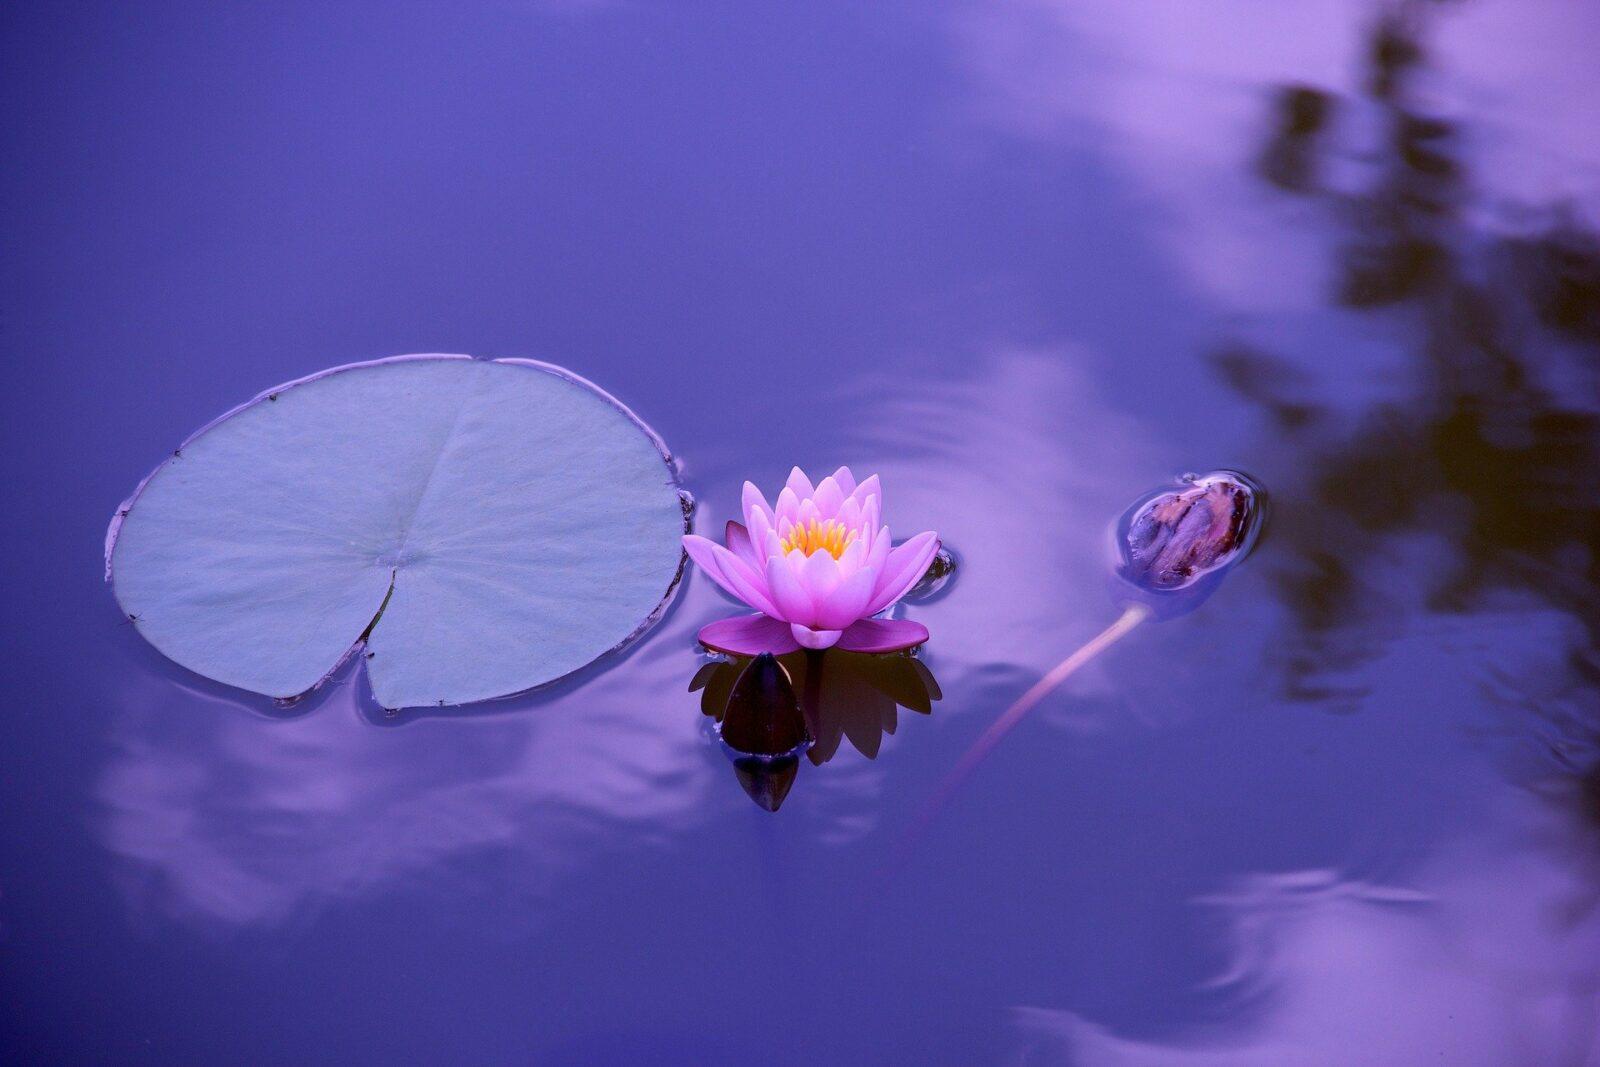 21 Rituale für mehr innere Ruhe